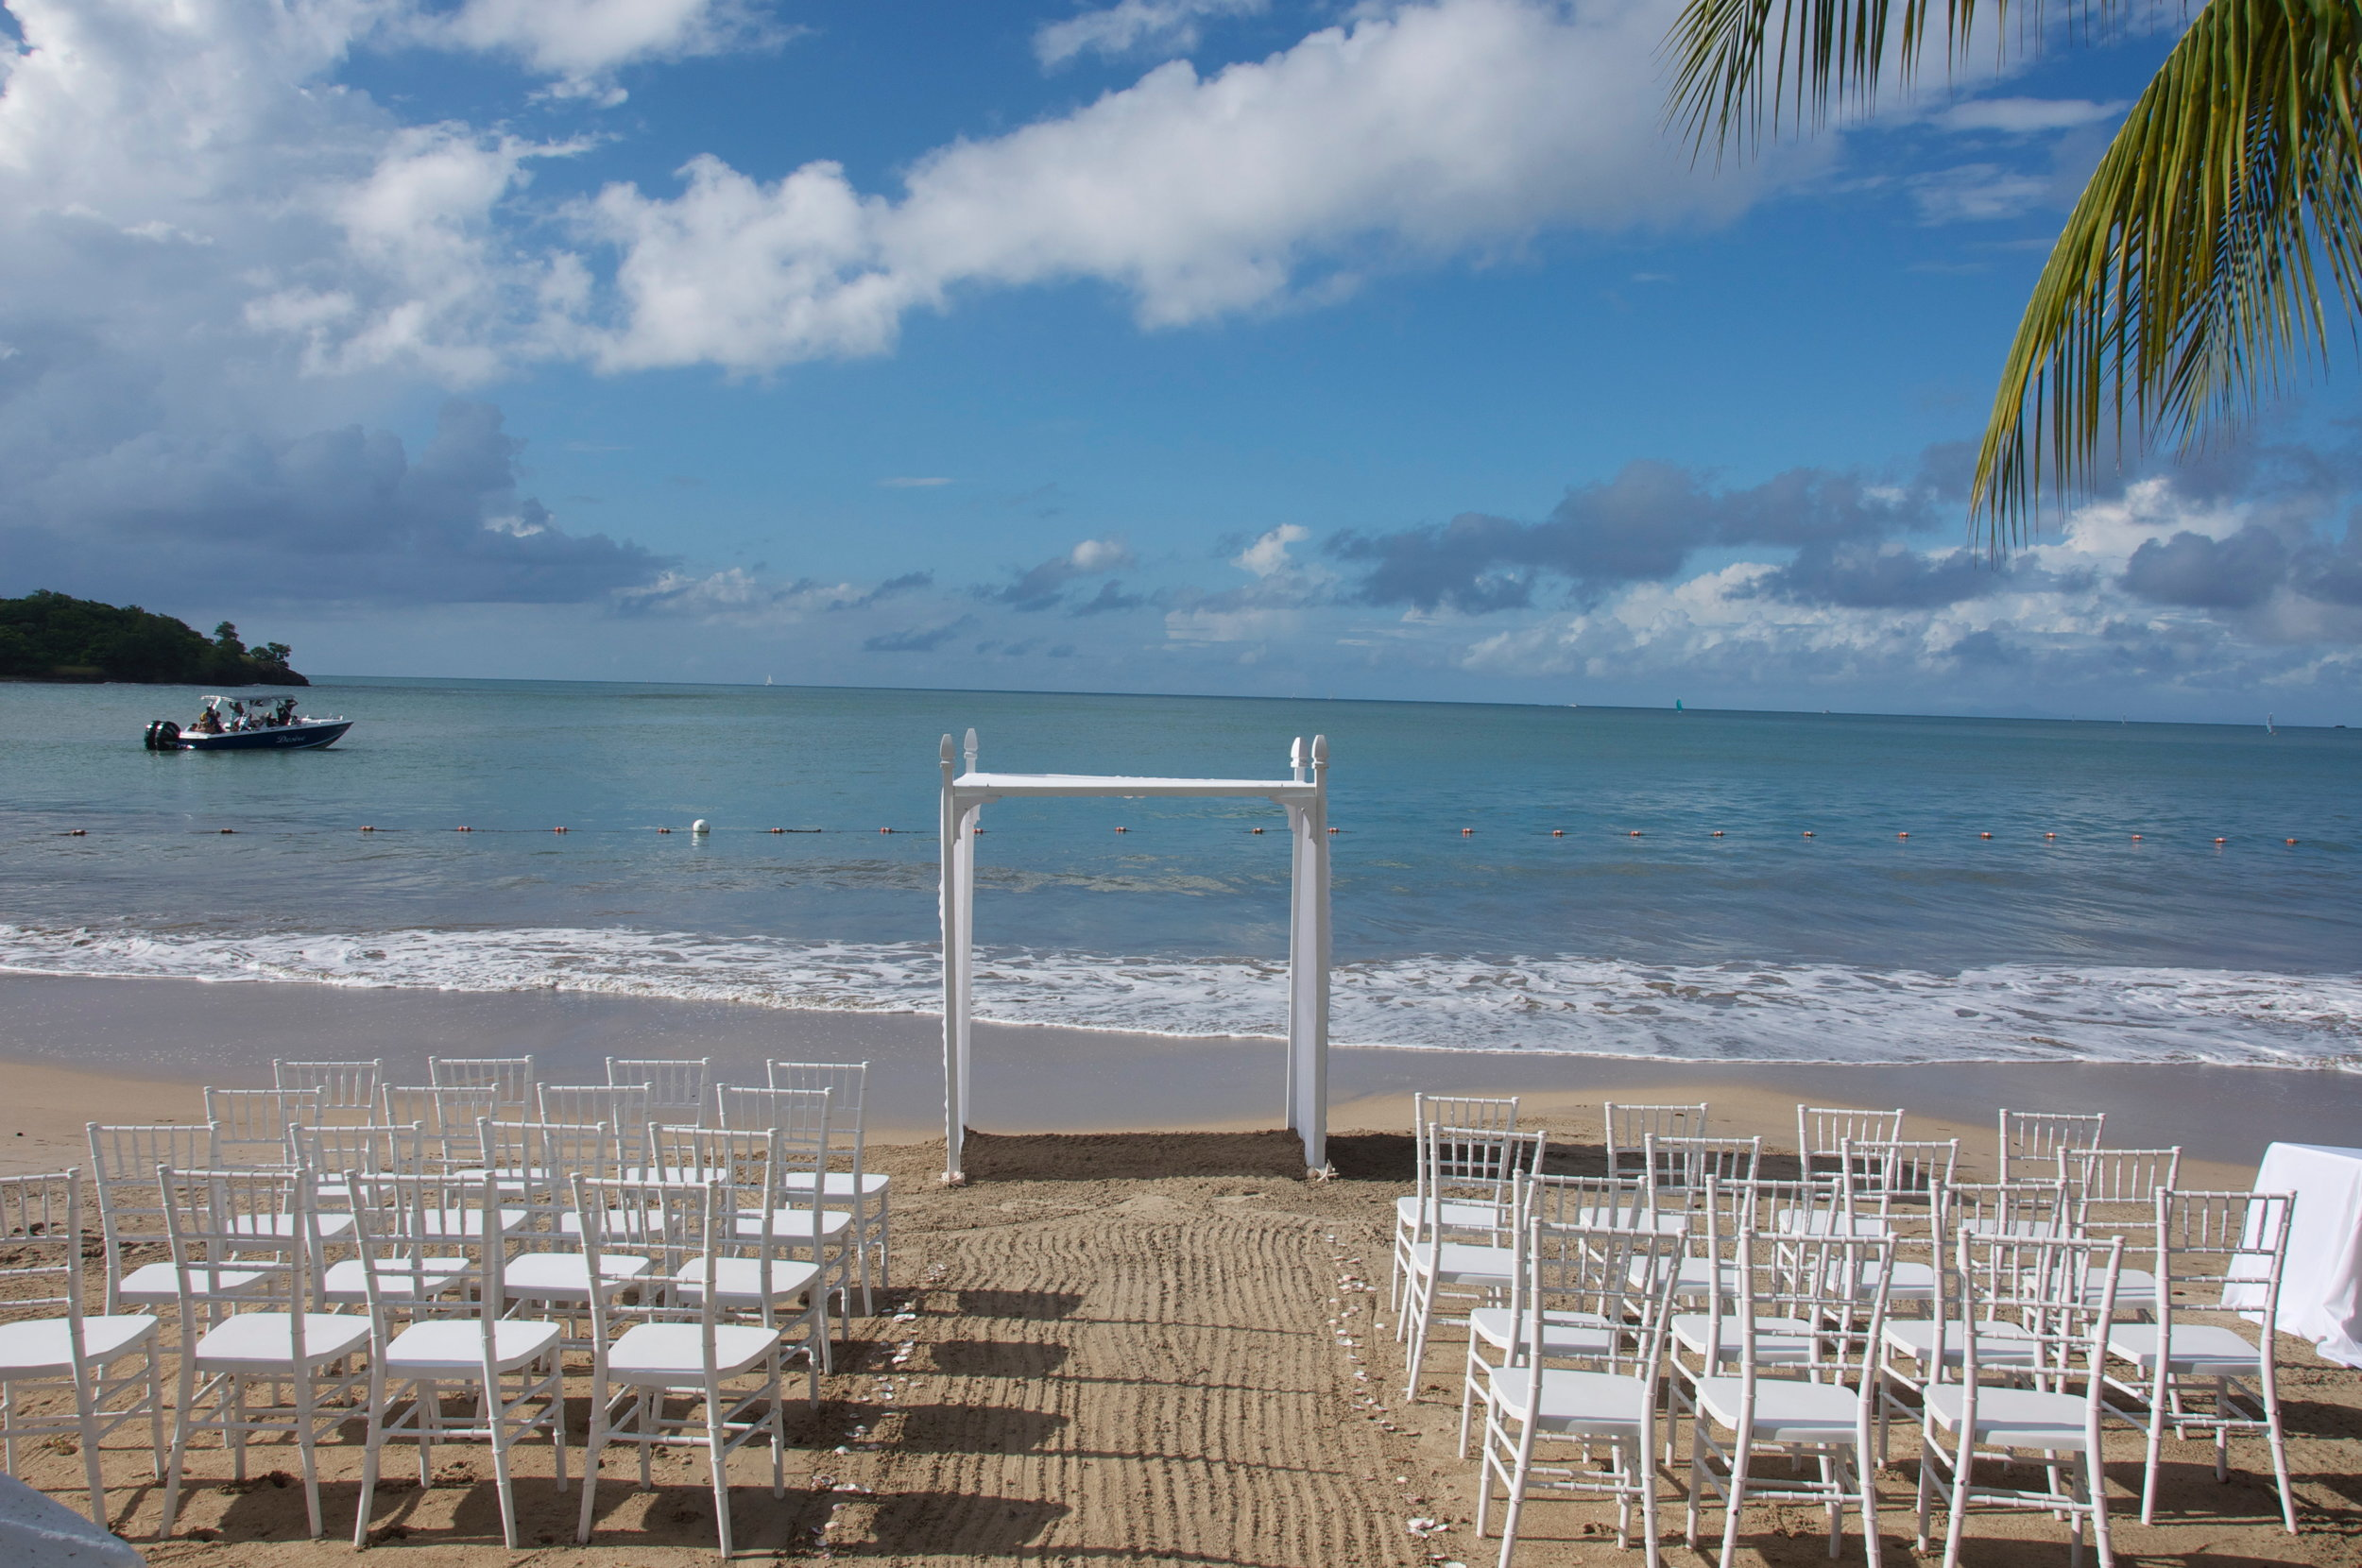 Sandals Halcyon Beach